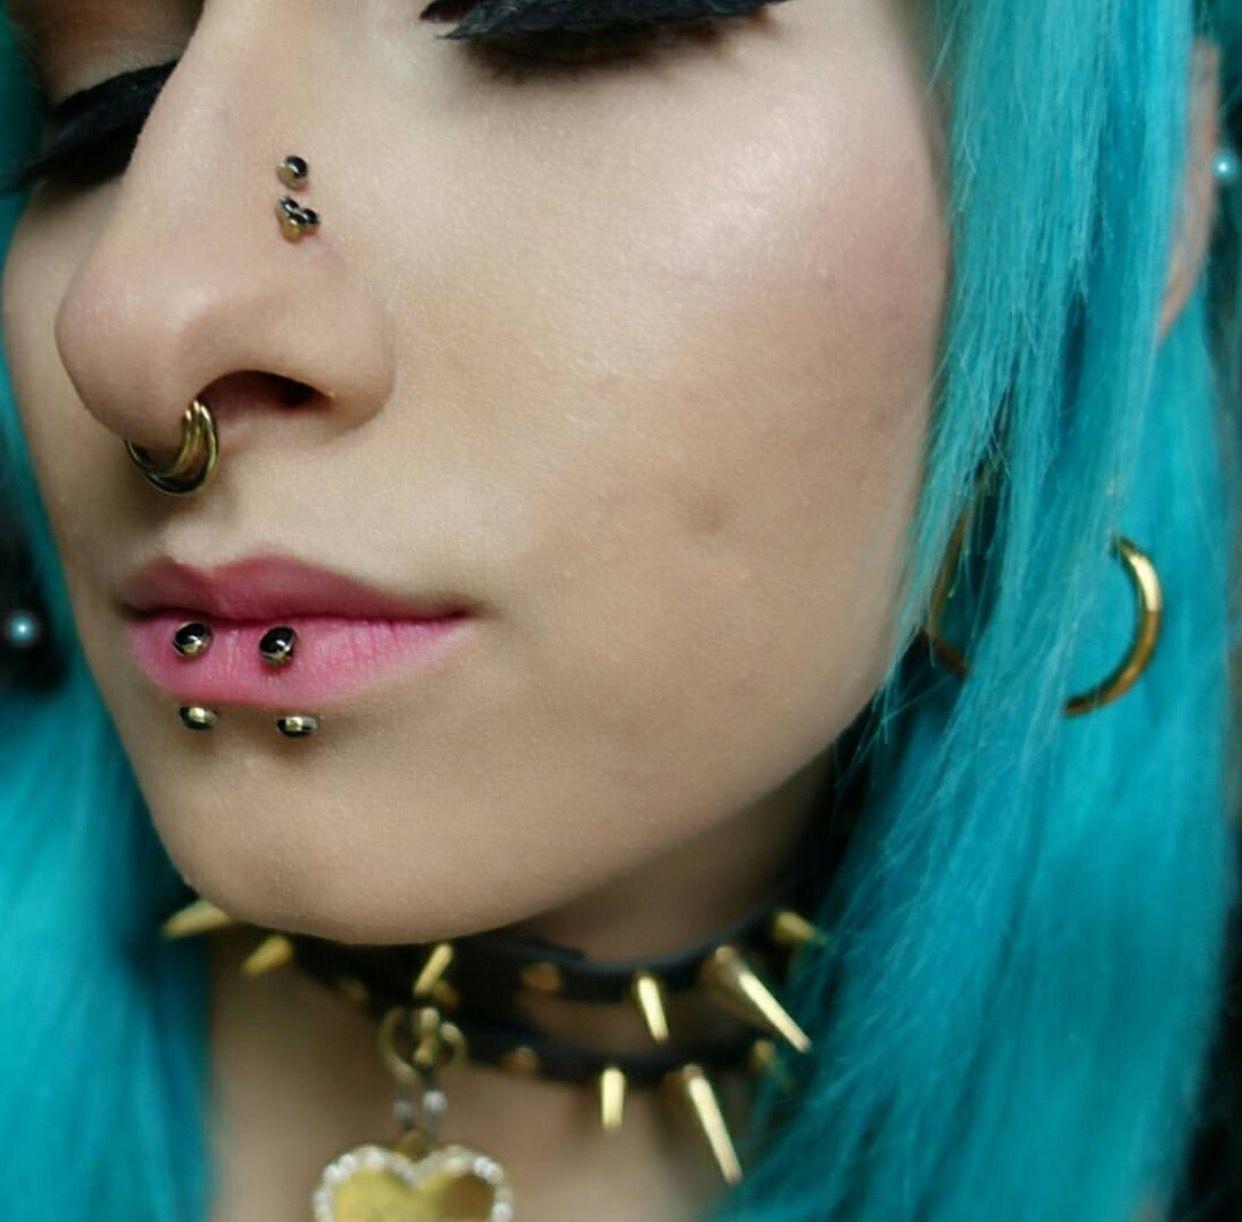 Girl nose piercing  Pin by Saria on Girl Crush  Pinterest  Pierced girls